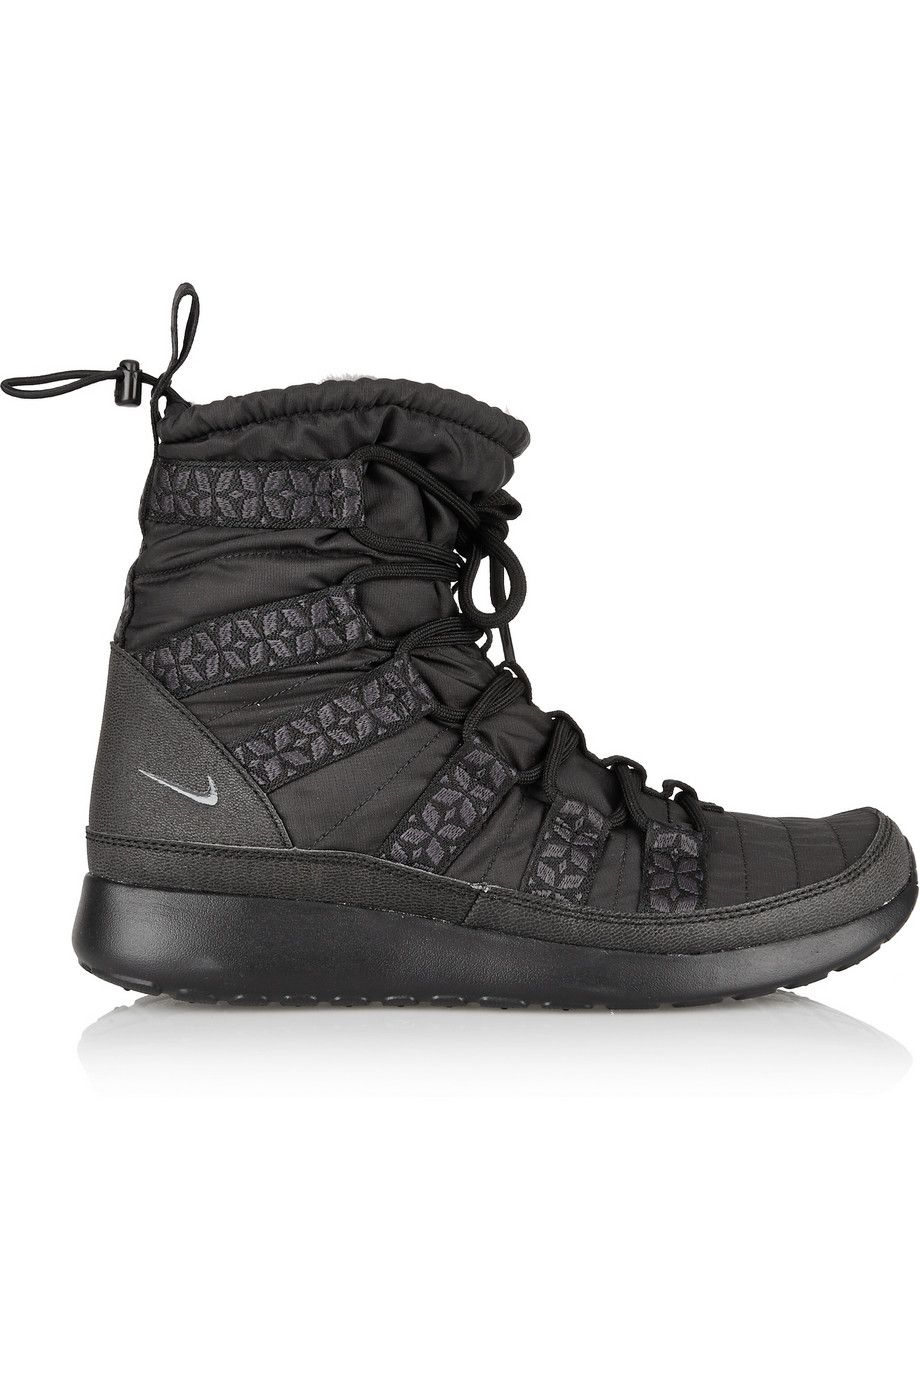 reputable site 33dac b7ee6 Nike   Roshe Run Hi shell sneaker-style boots   NET-A-PORTER.COM